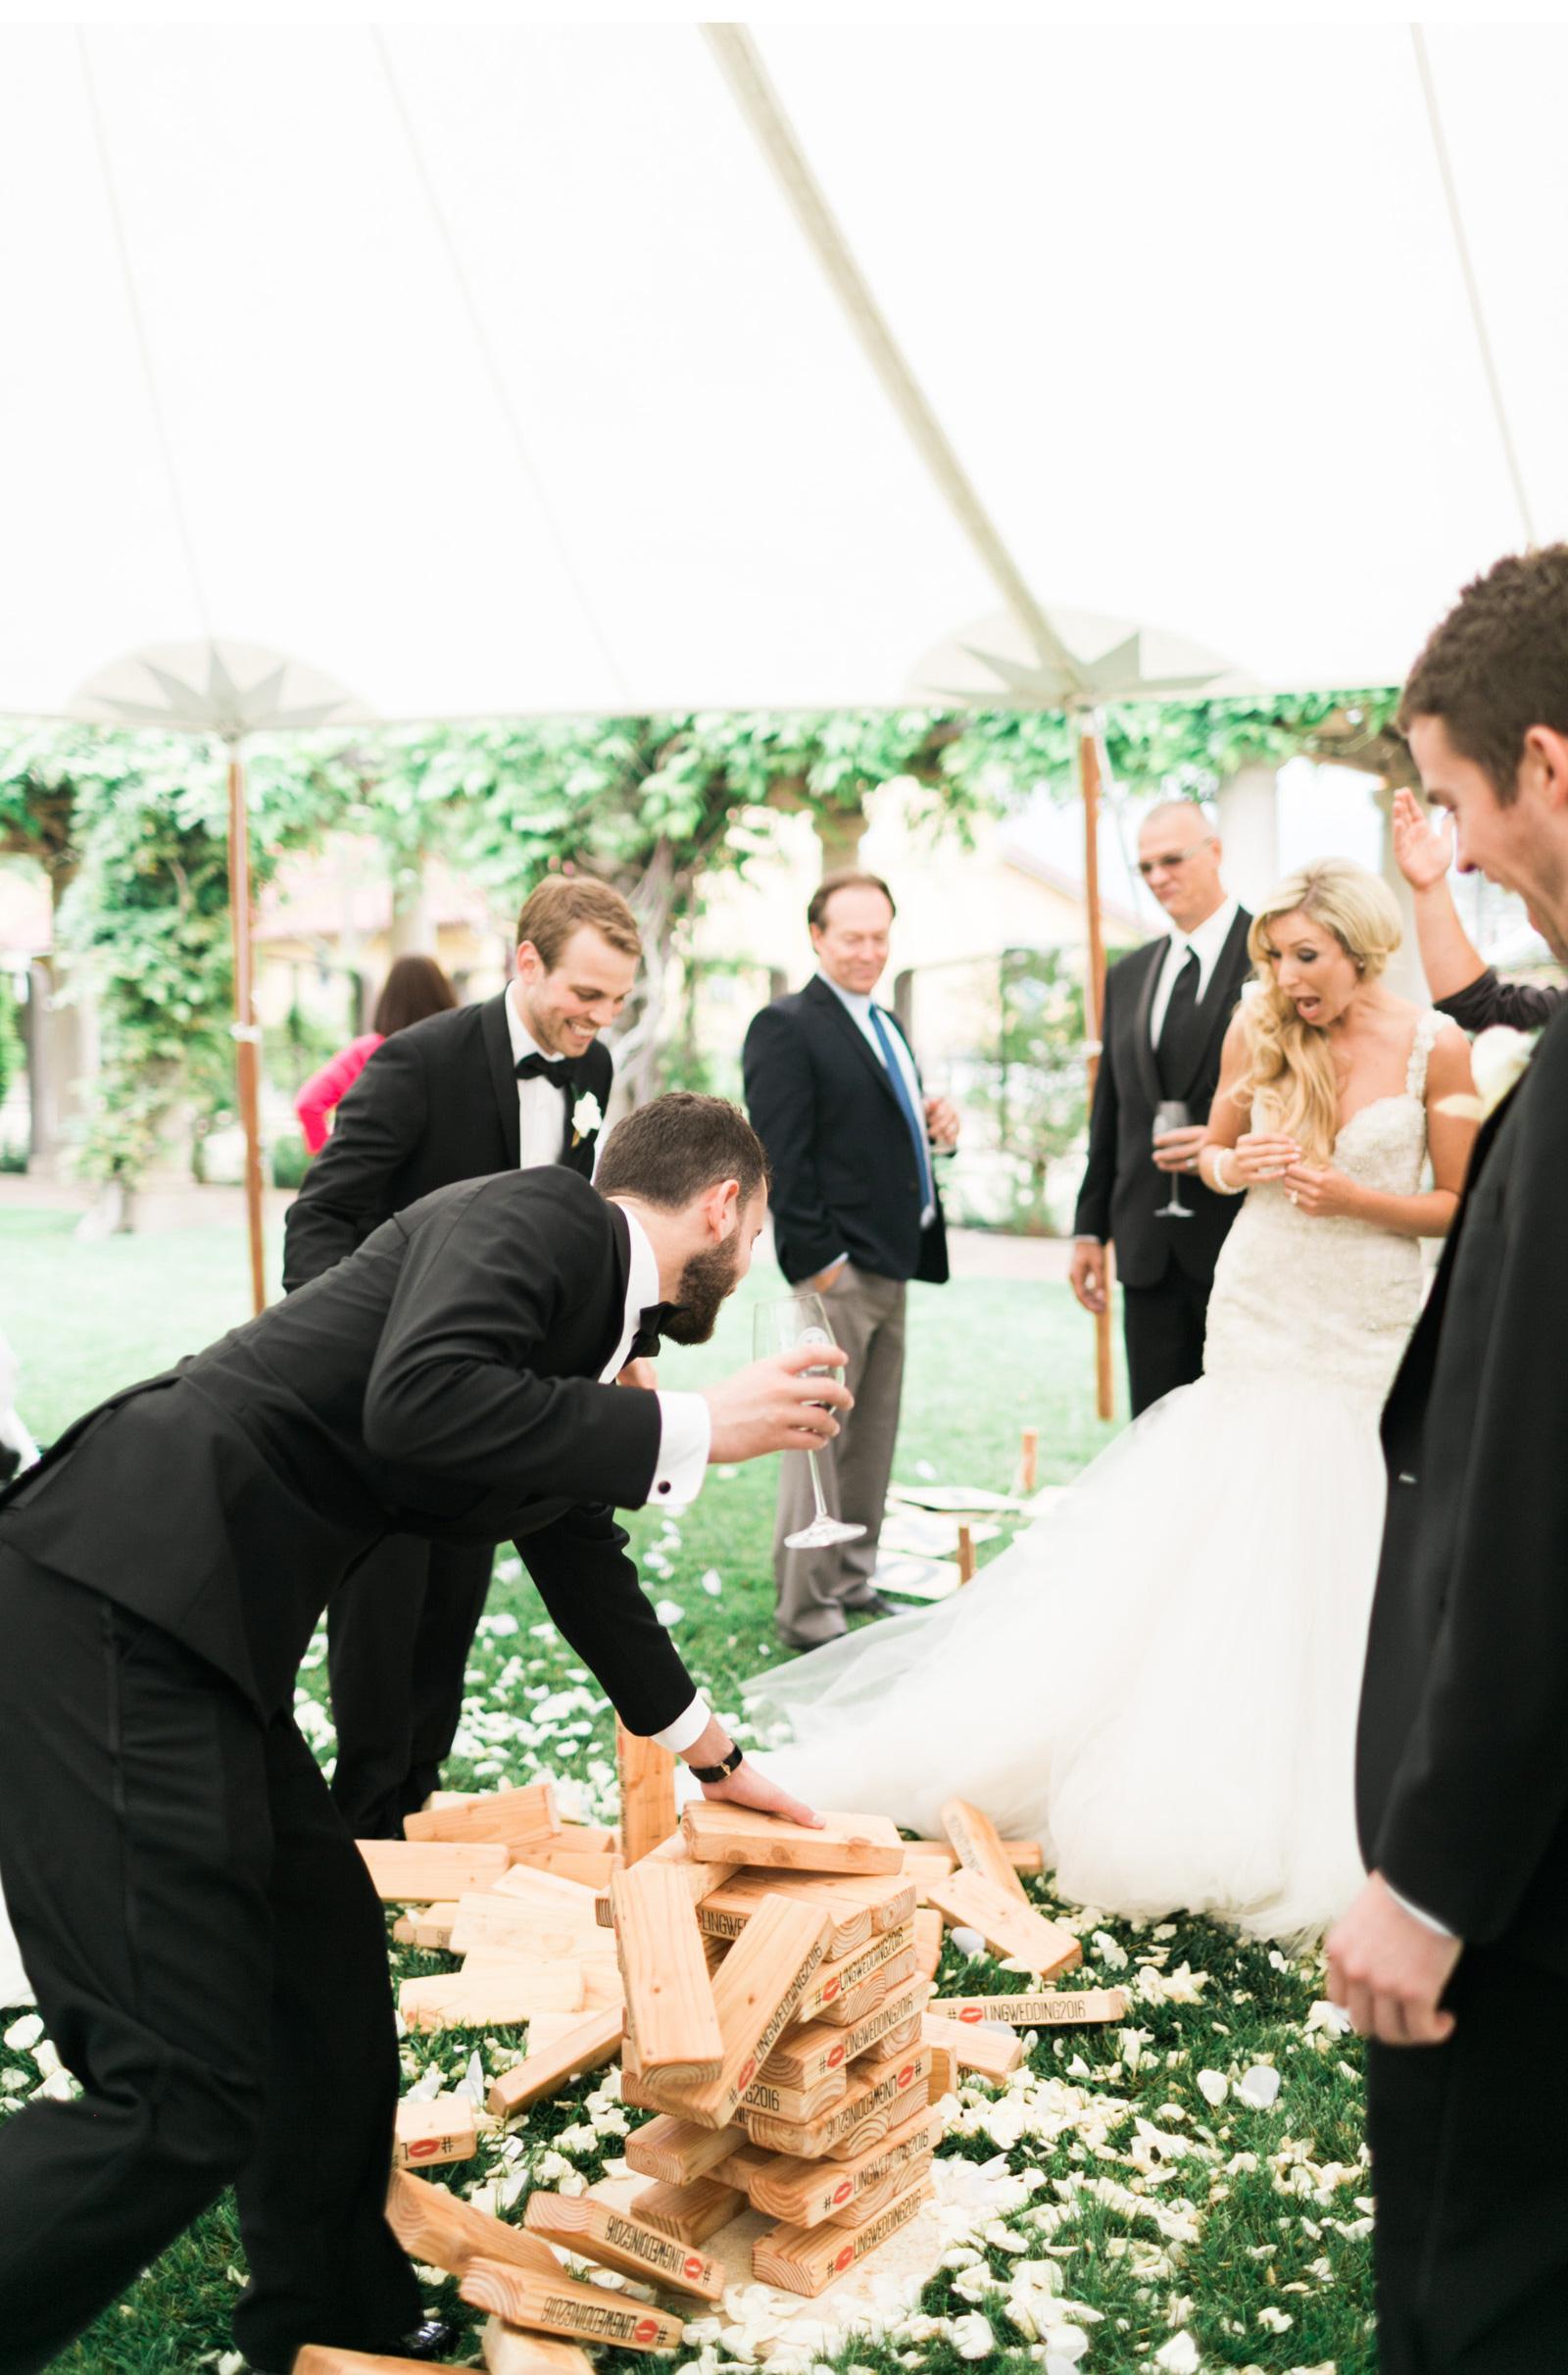 Destination-Adventure-Wedding-Photographer-Natalie-Schutt-Photography_01.jpg